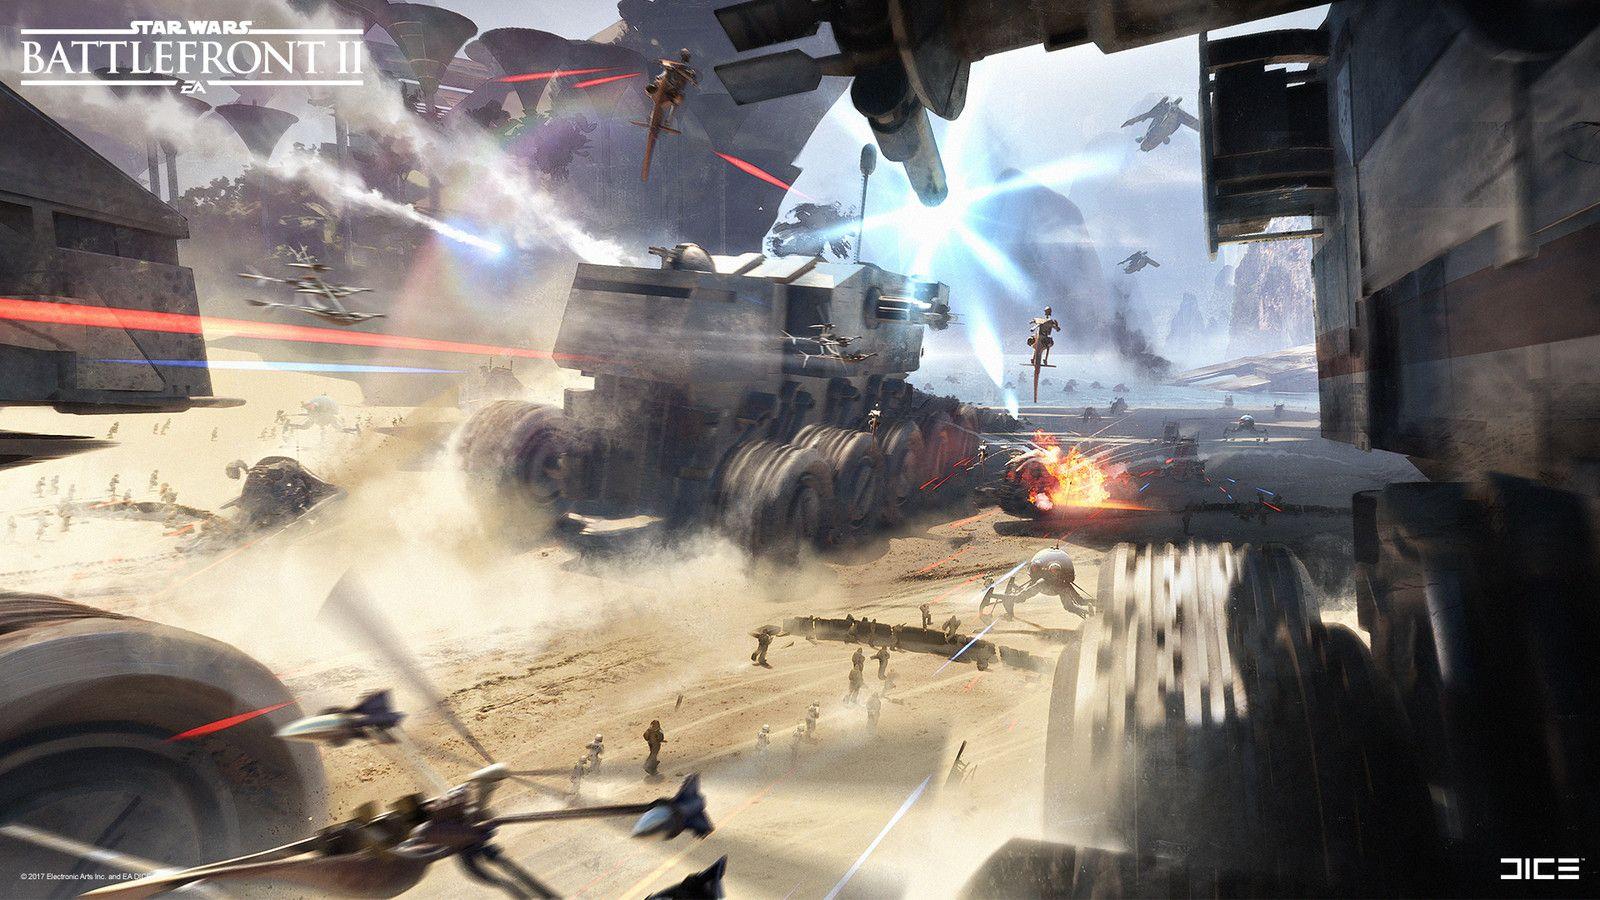 Battlefront 2 Early Concept Exploration Kashyyyk Anton Grandert On Artstation At Https Www Artstation Com Artw Star Wars Images Star Wars Ships Star Wars